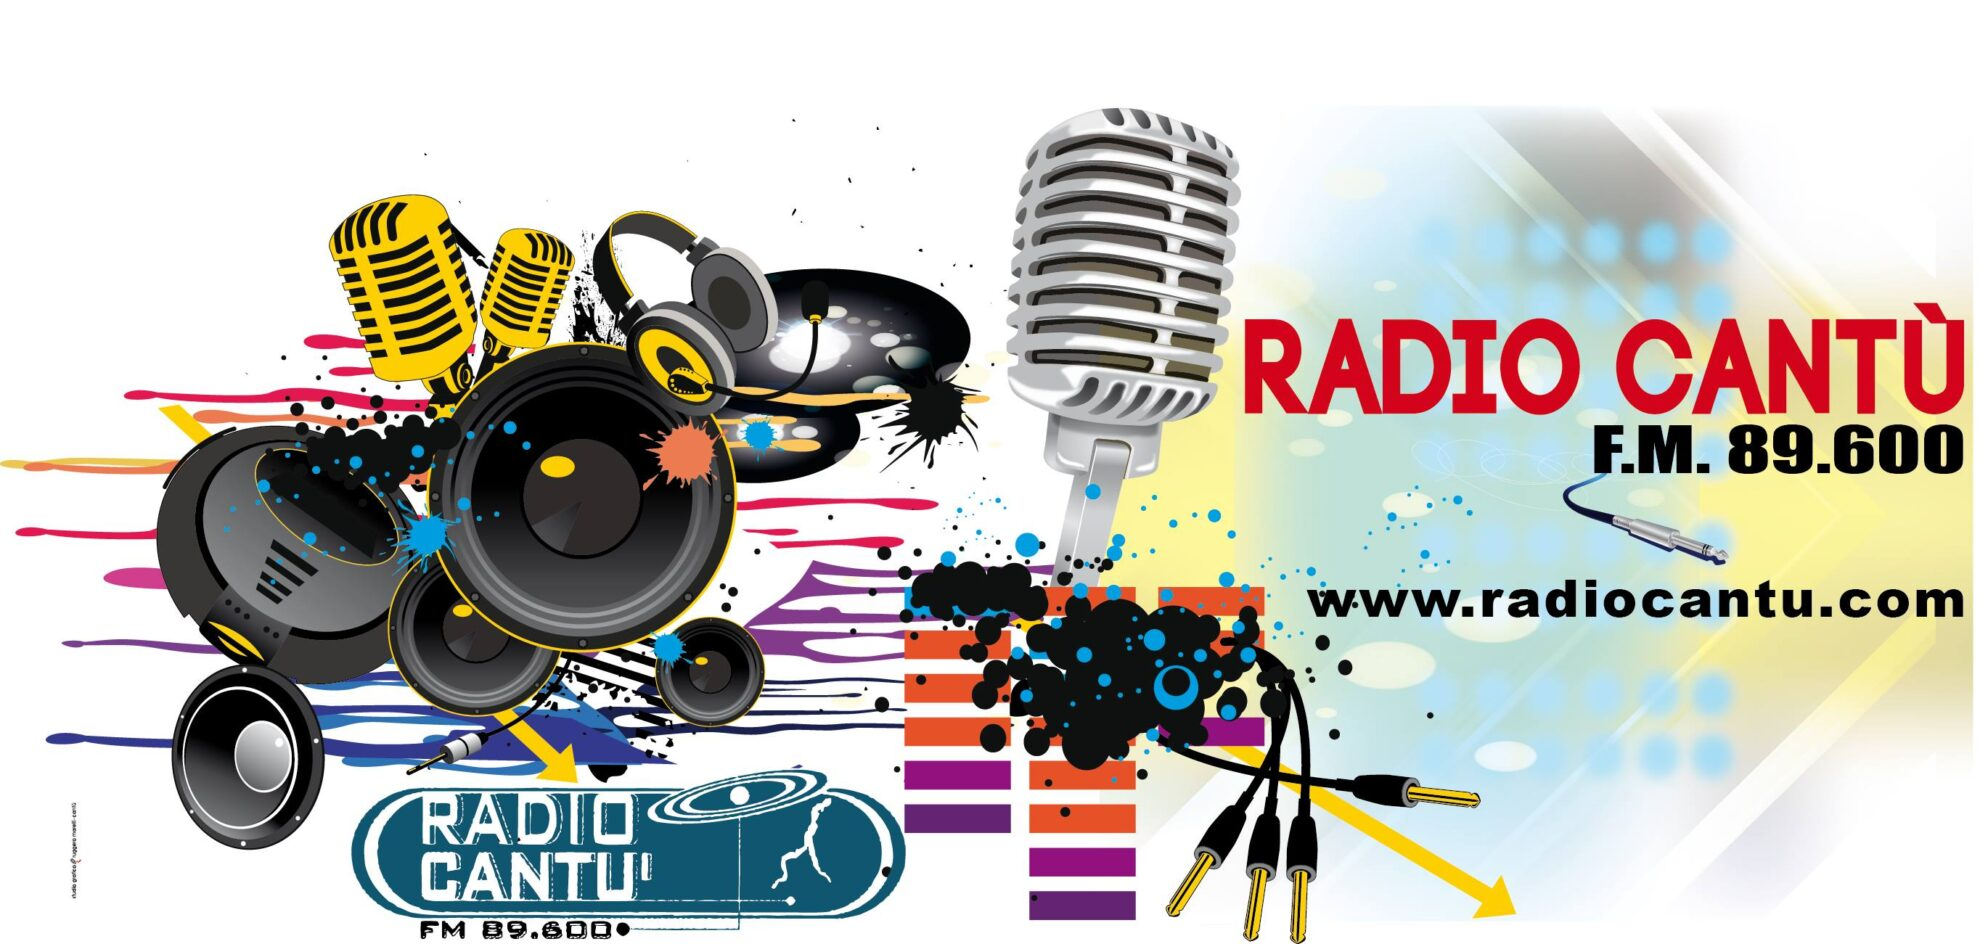 Radio Cantù fm 89,600